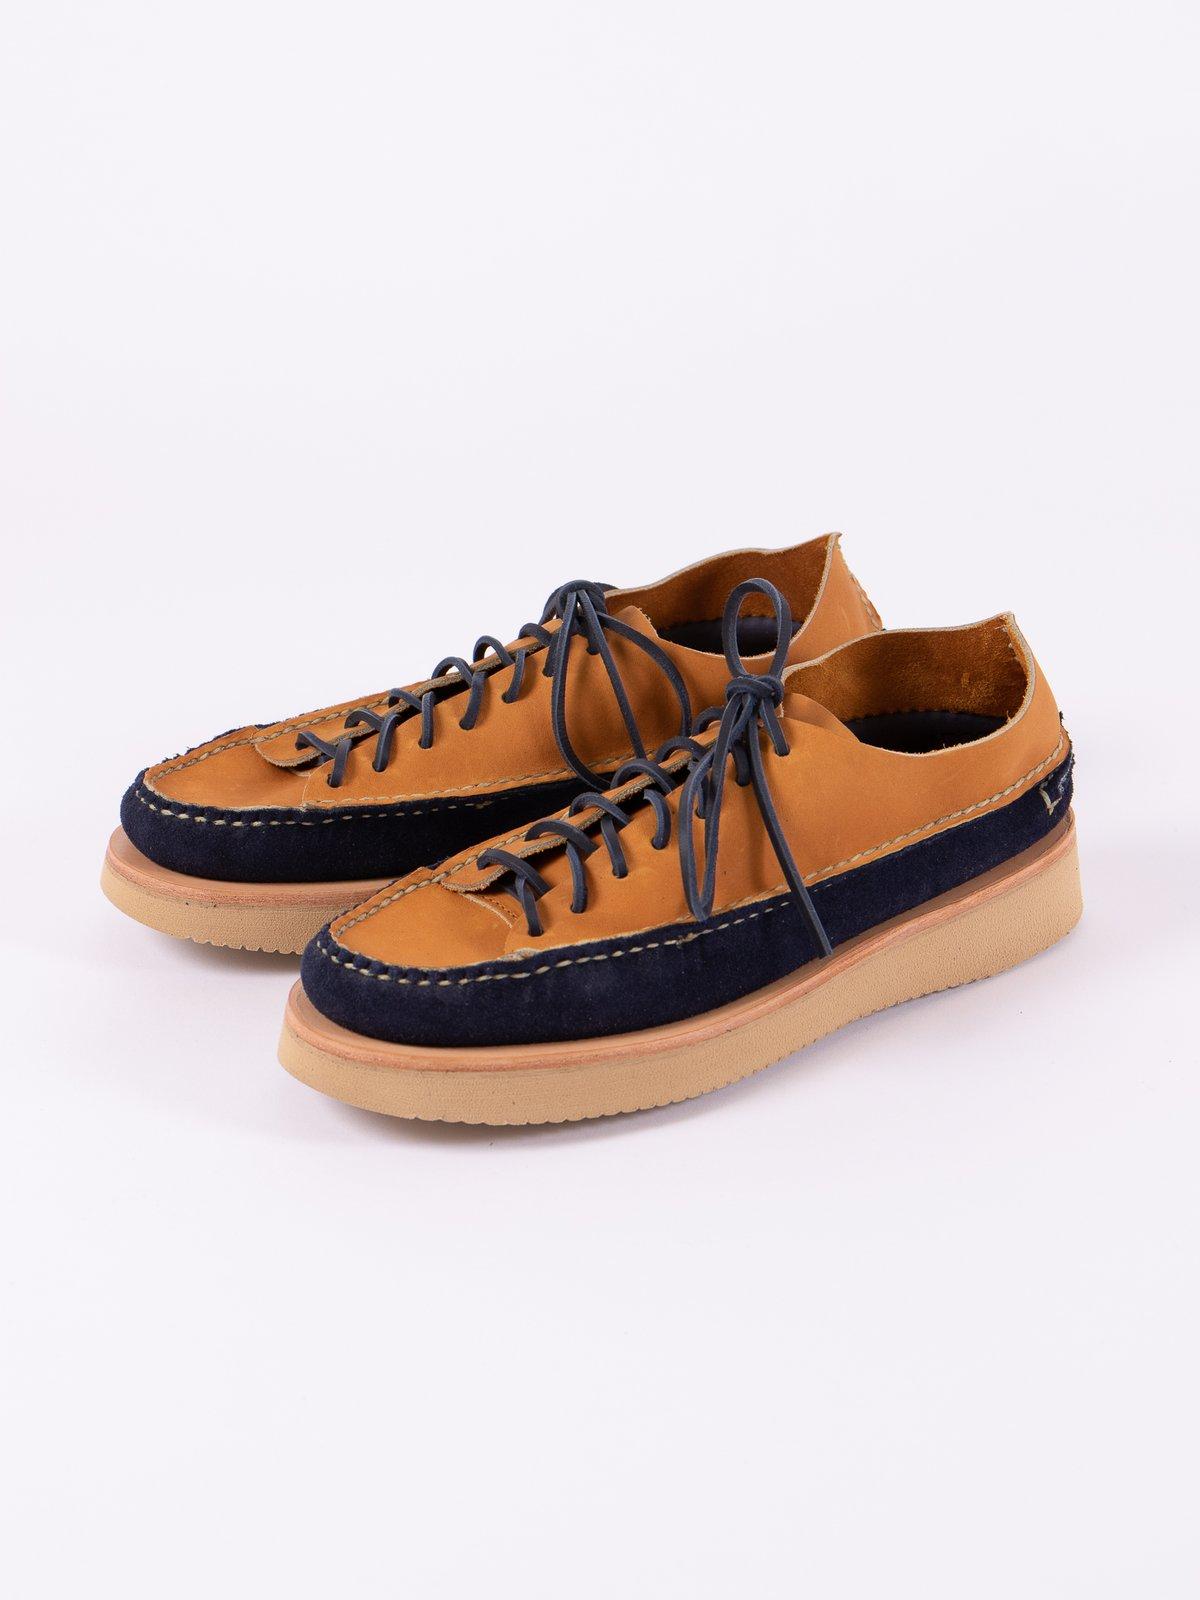 Indigo/Tan All Handsewn Sneaker Moc Ox Exclusive - Image 2